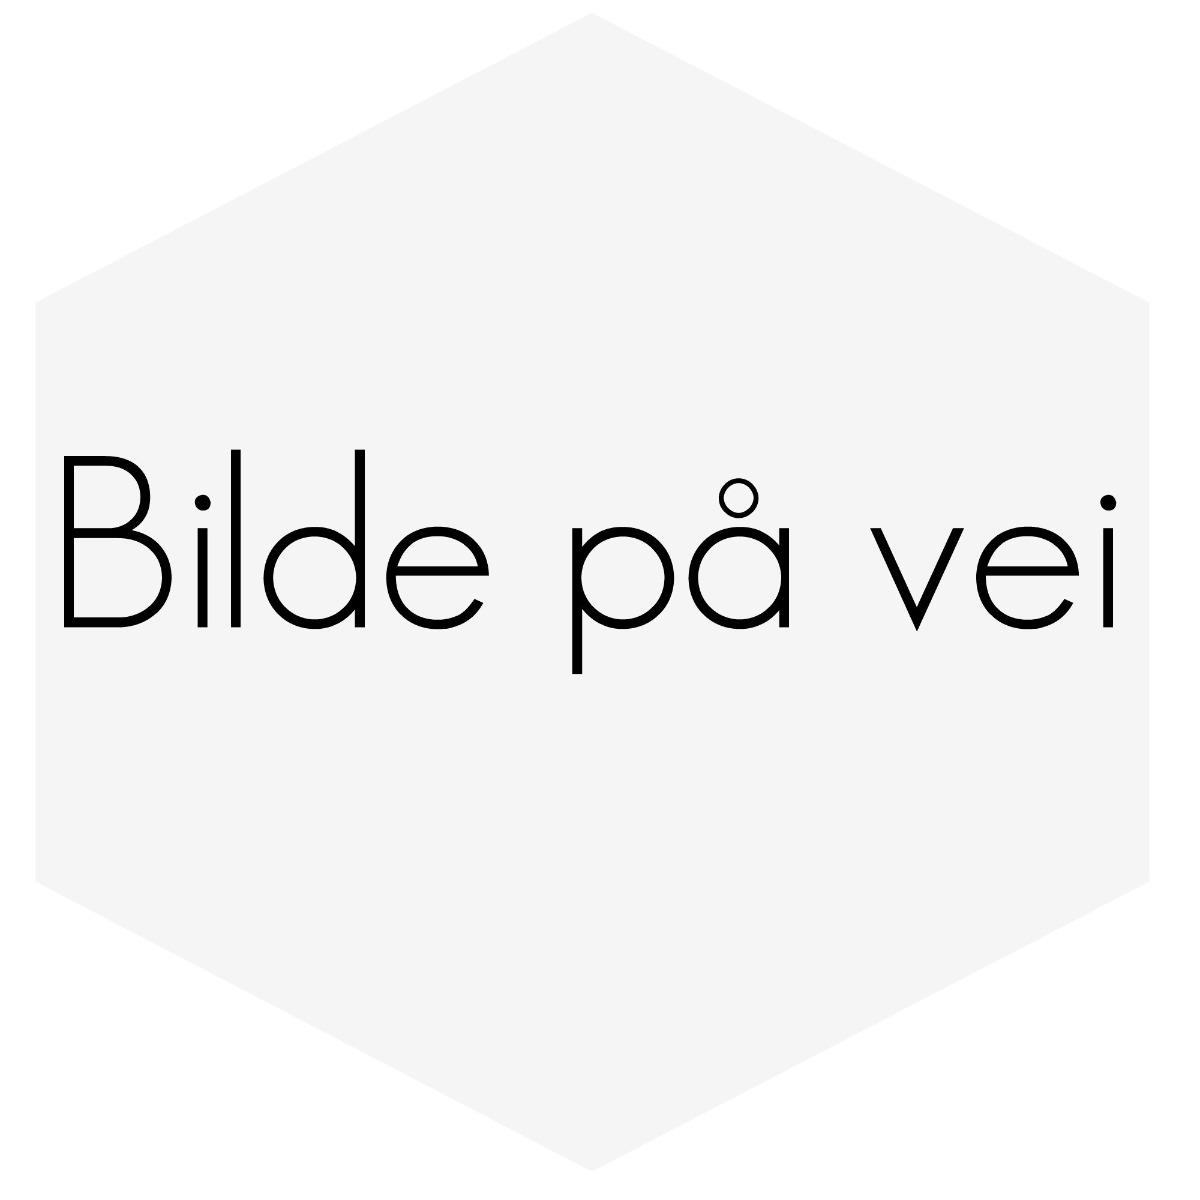 "SILIKONSLANGE RØD REDUSERING 3-3,125"" (76-80MM)"